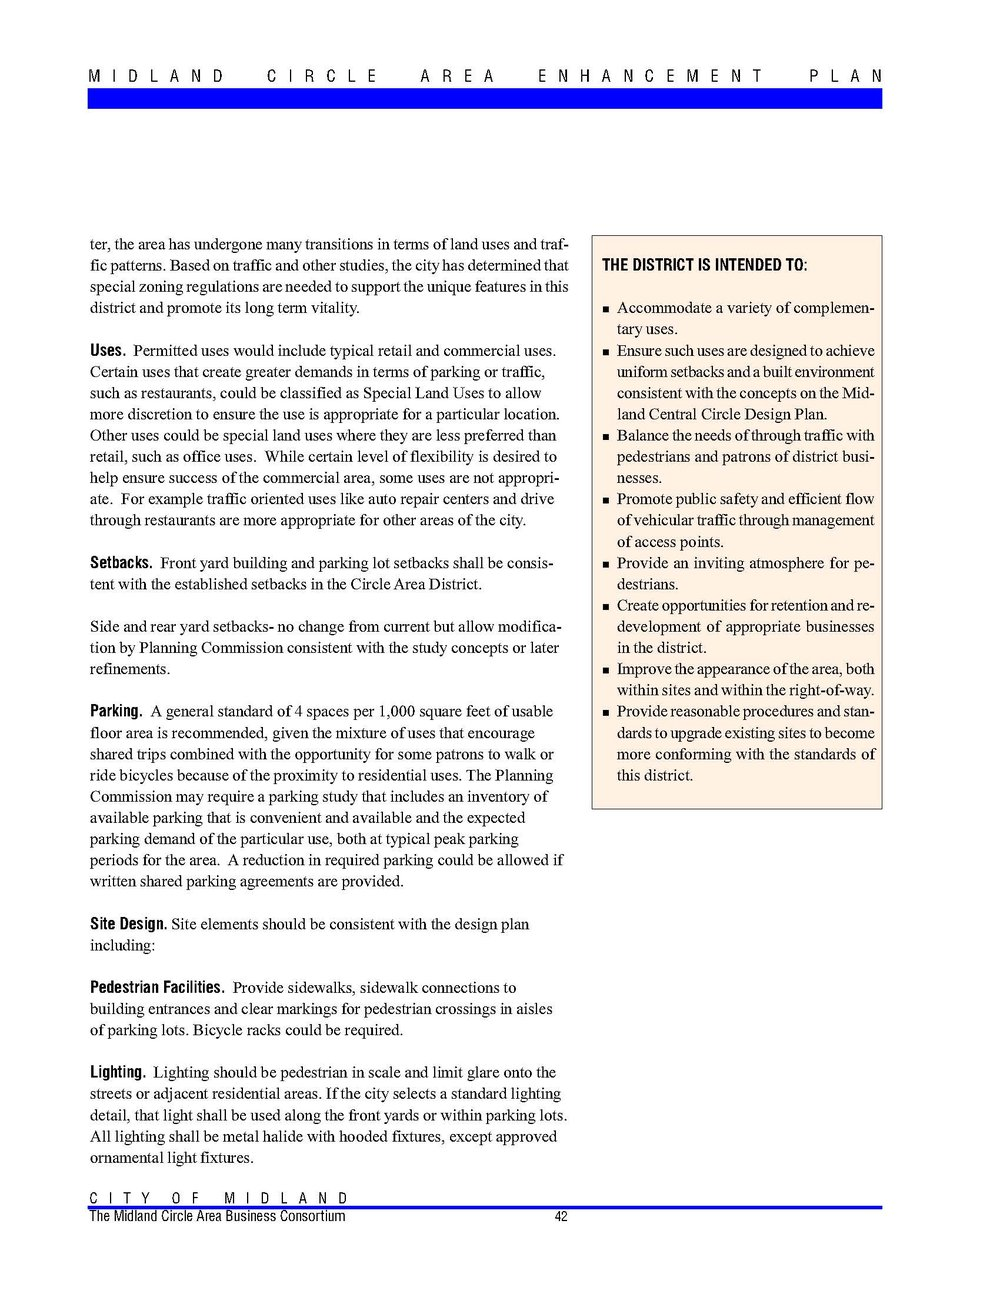 Ashman Circle Enhancement Plan_Page_44.jpg